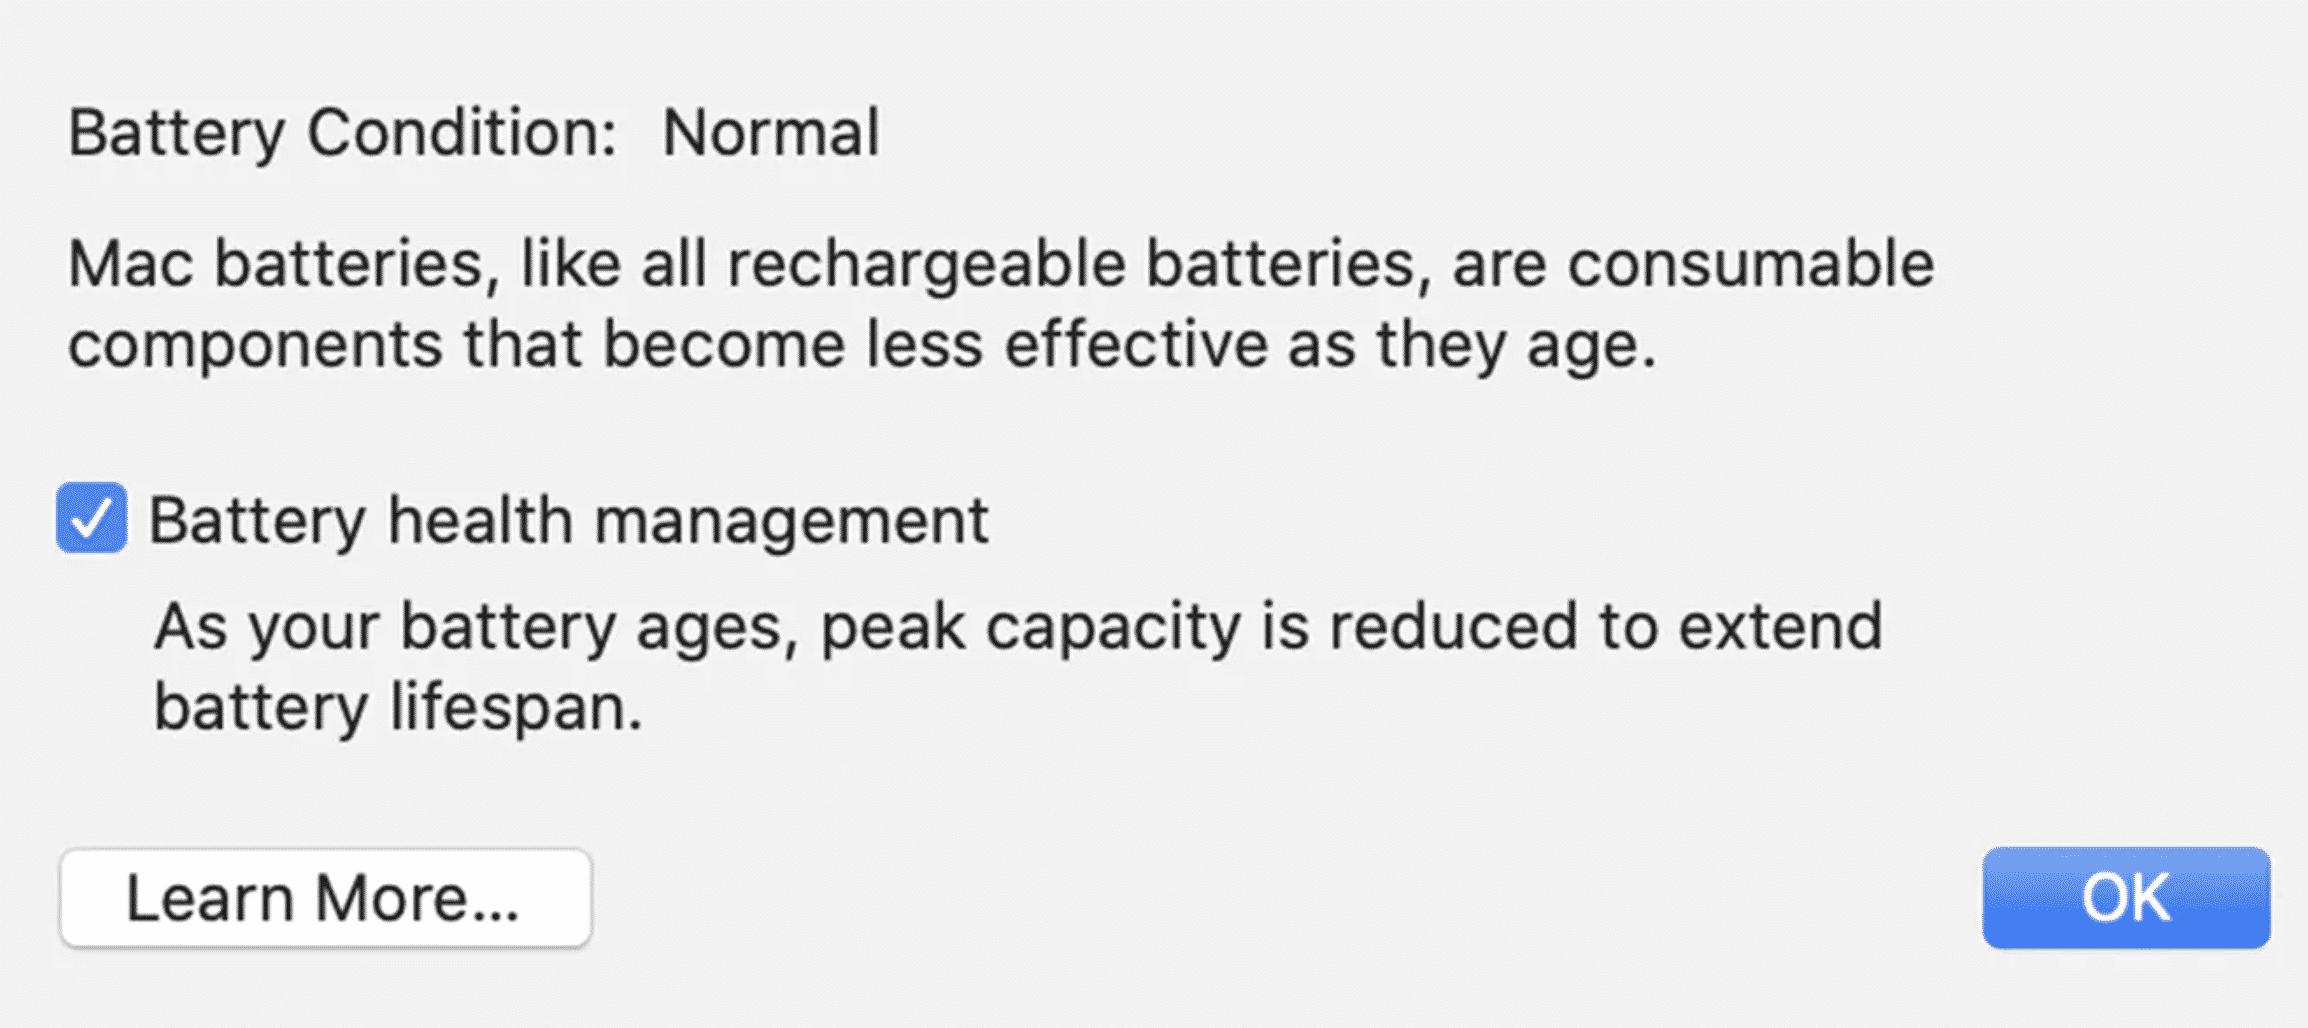 Battery Health Management